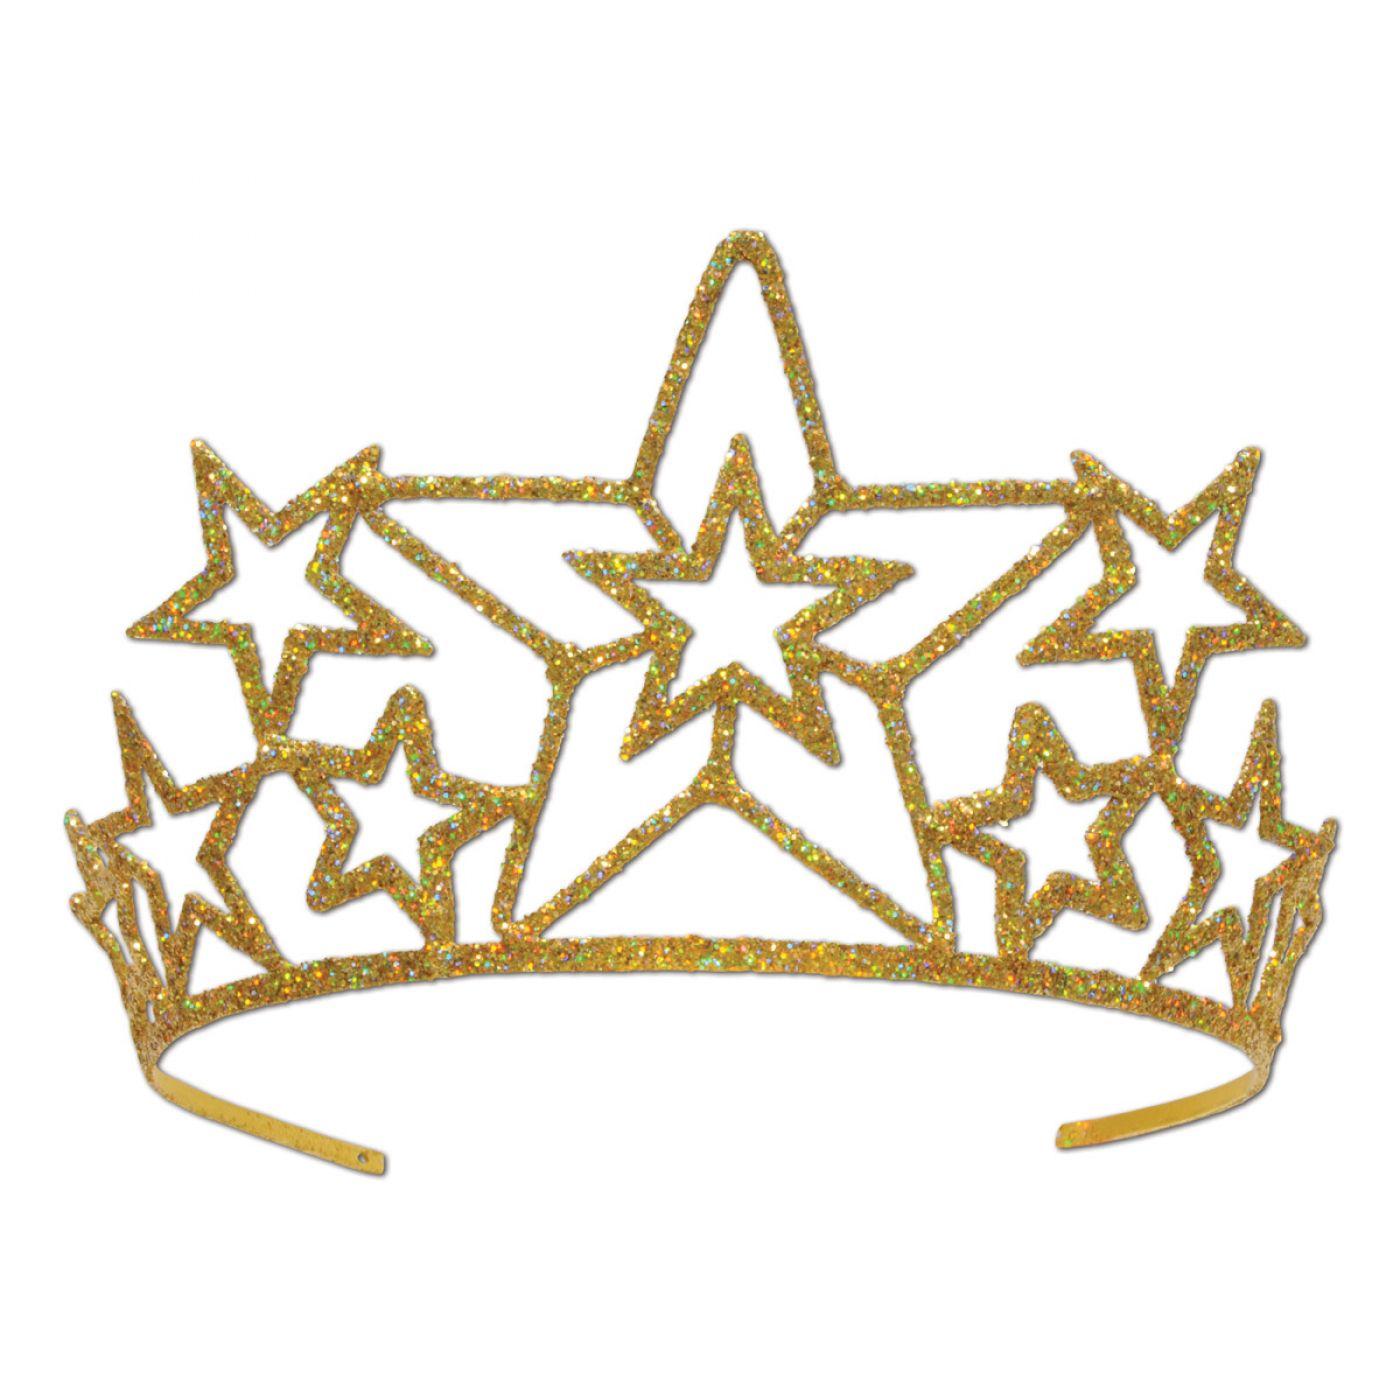 Glittered Metal Star Tiara (6) image